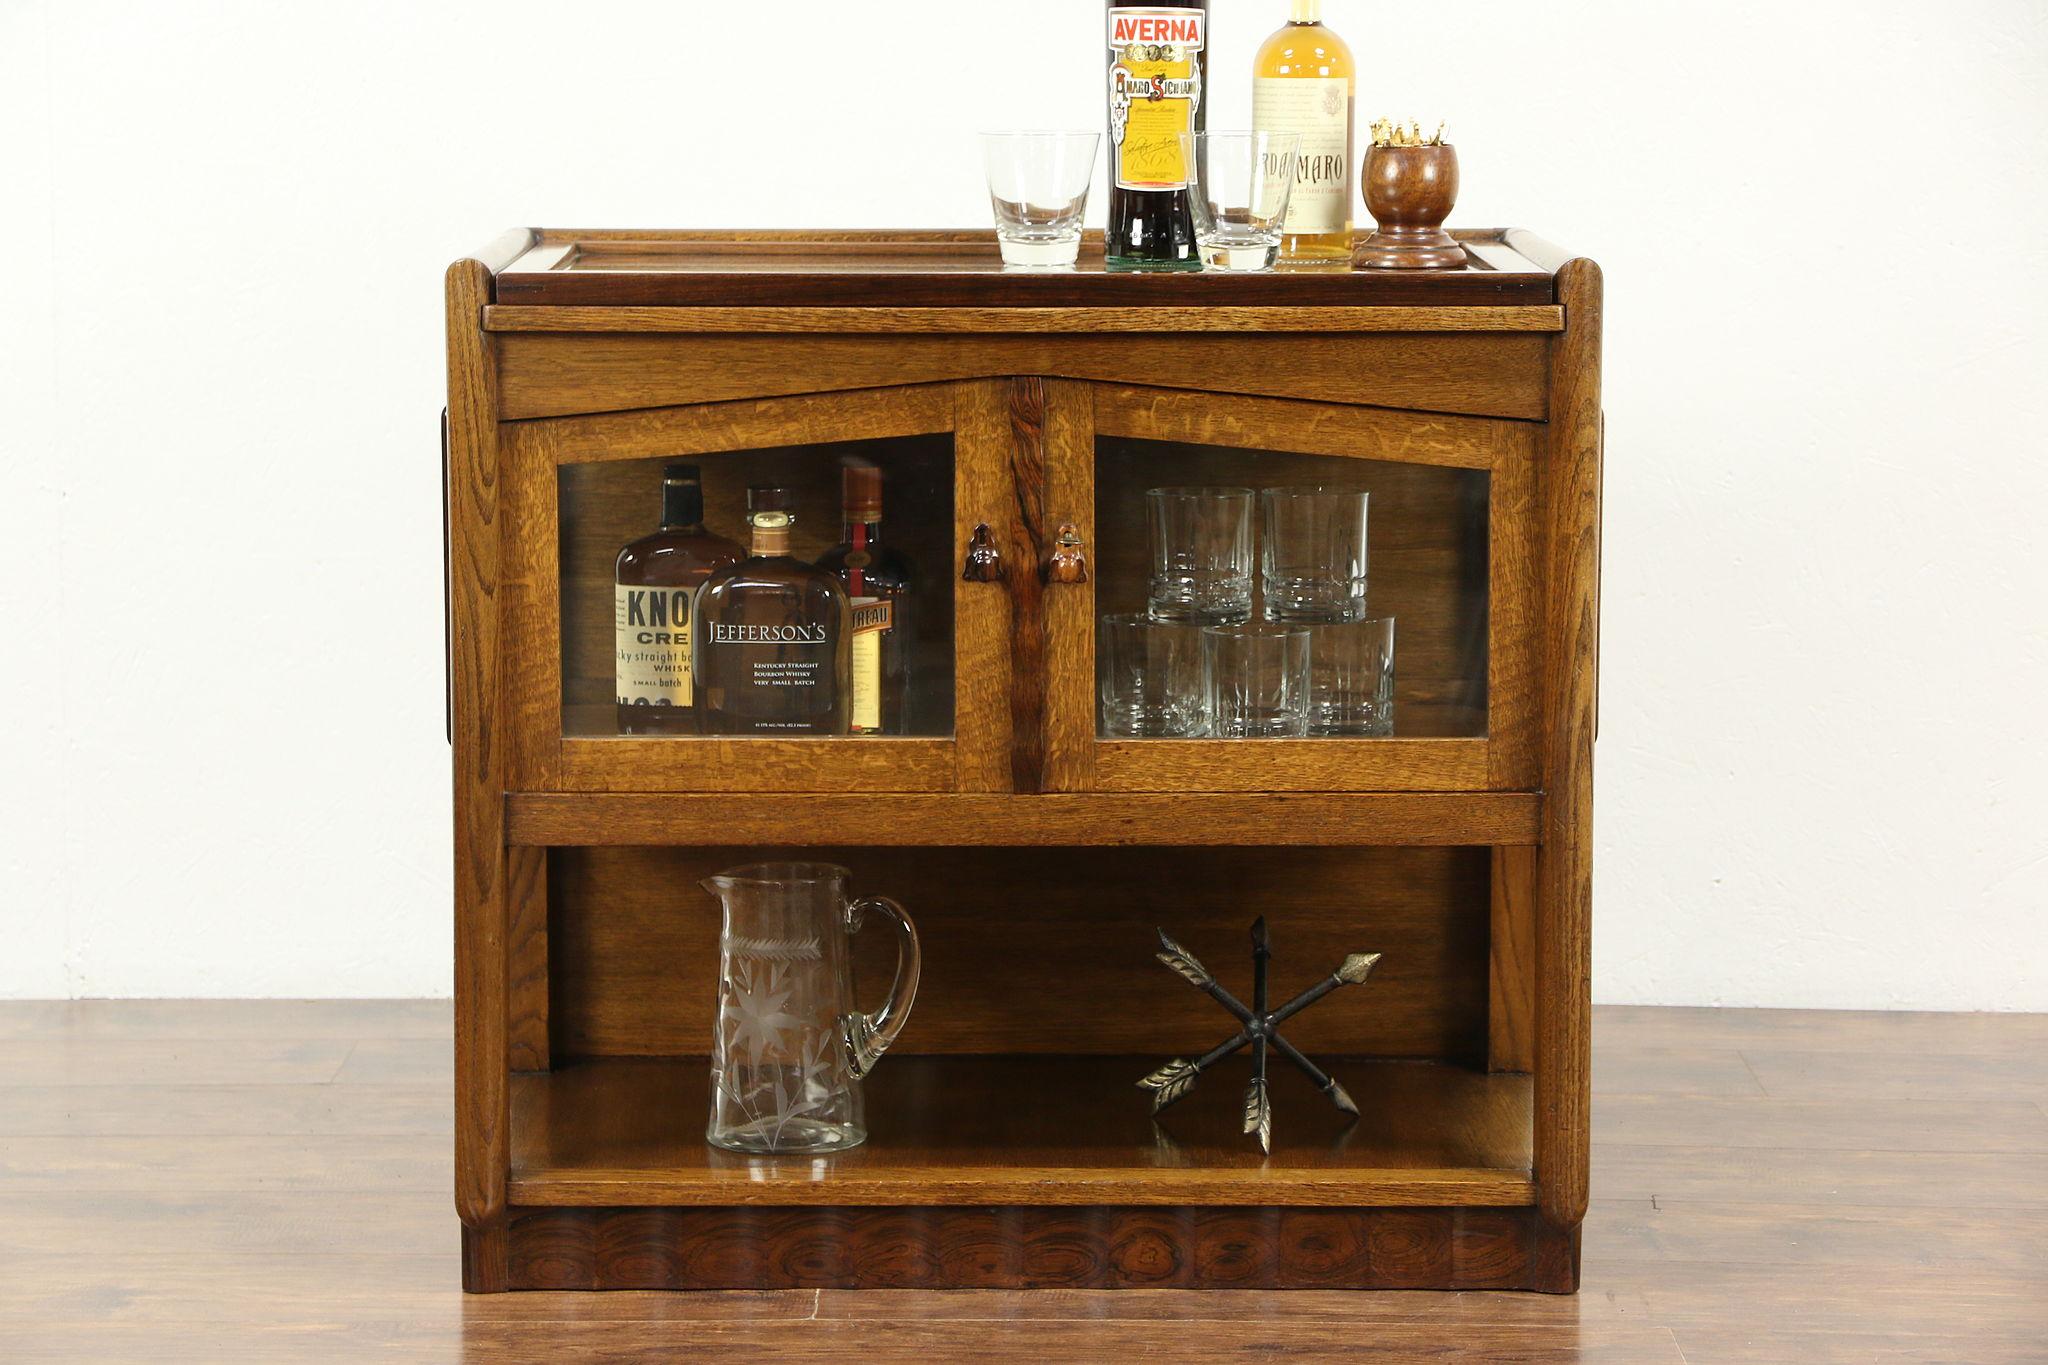 Delicieux Art Deco 1925 Vintage Bar Cabinet U0026 Tray, Oak U0026 Rosewood, Scandinavia